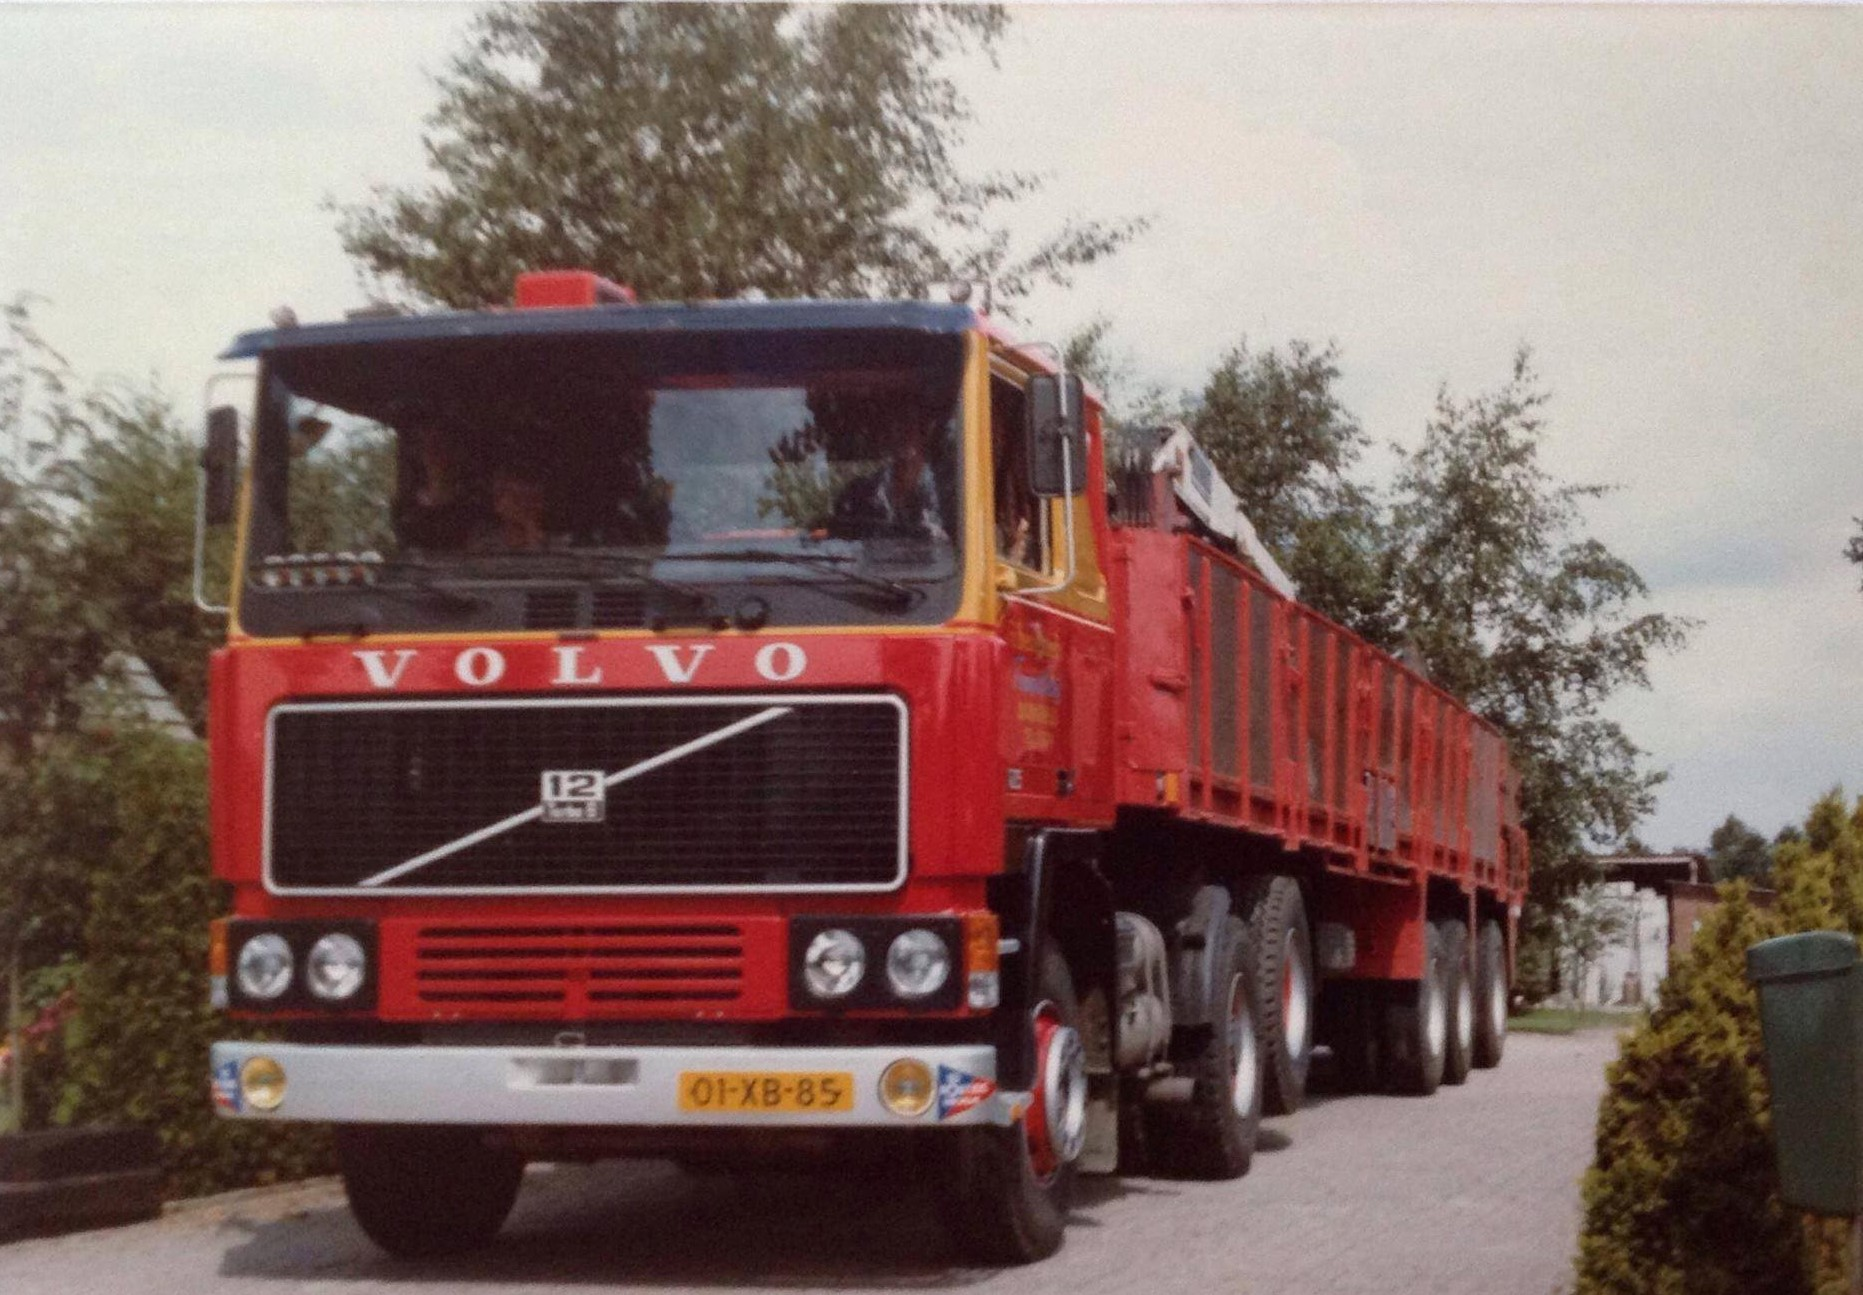 Volvo-F12-01-XB-85